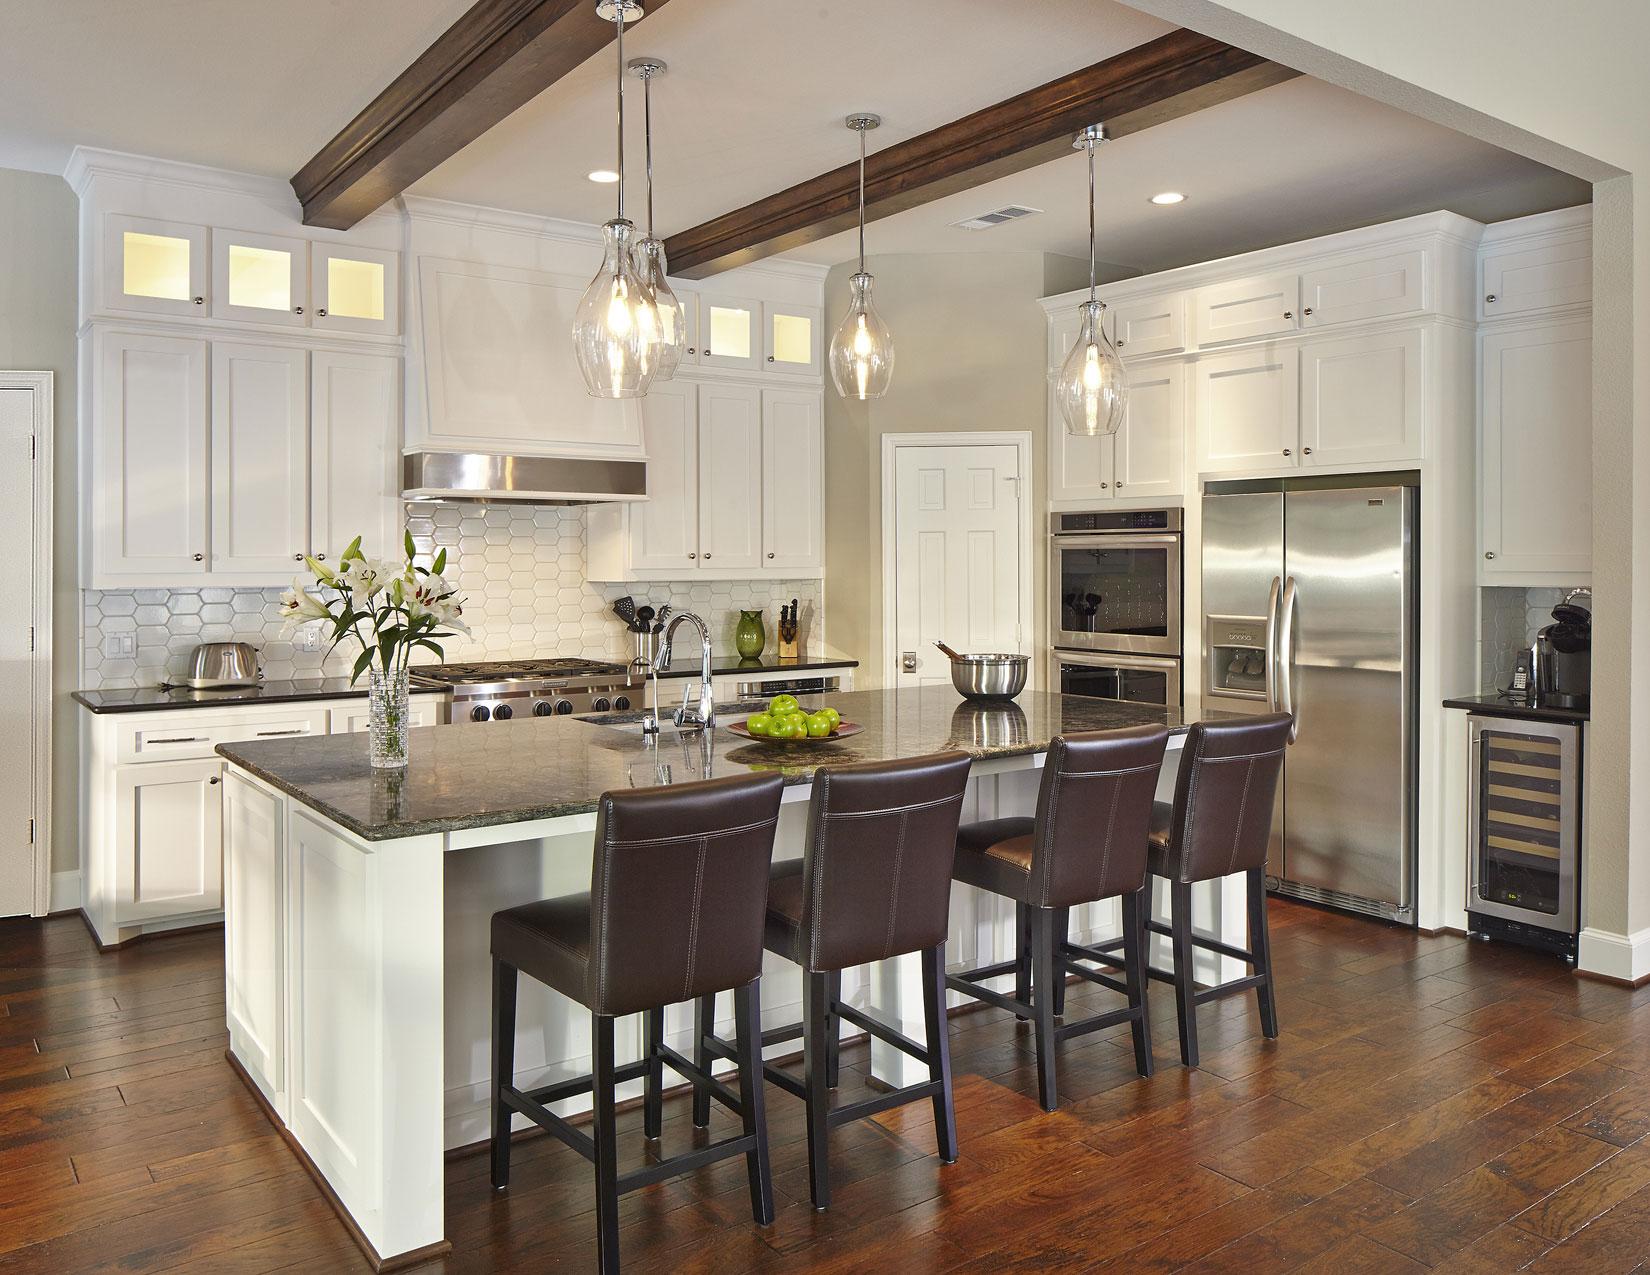 kitchen remodel dallas pans remodeling design build contact us